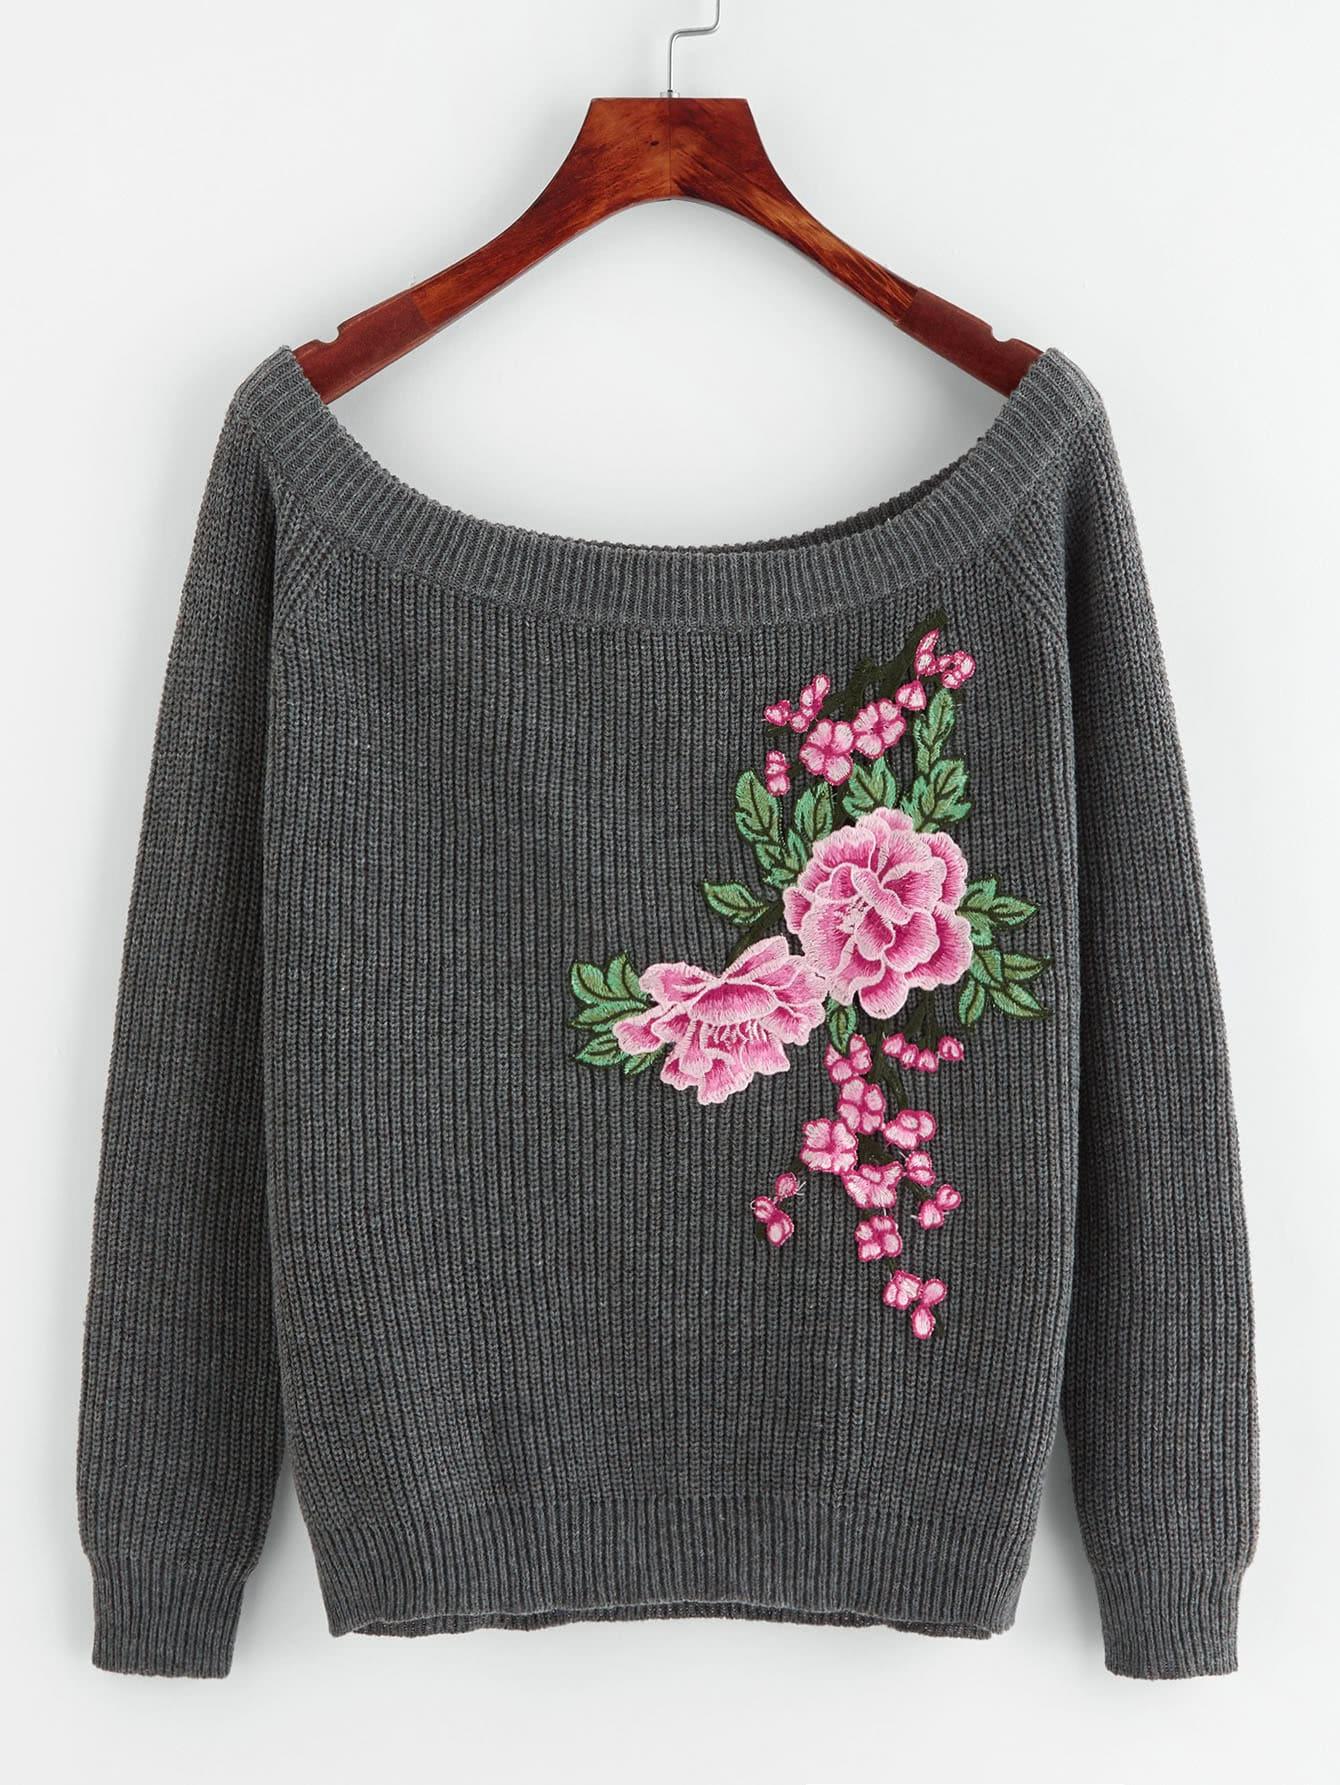 Embroidered Flower Patch Raglan Sleeve Jumper girls spot embroidered sleeveless jumper